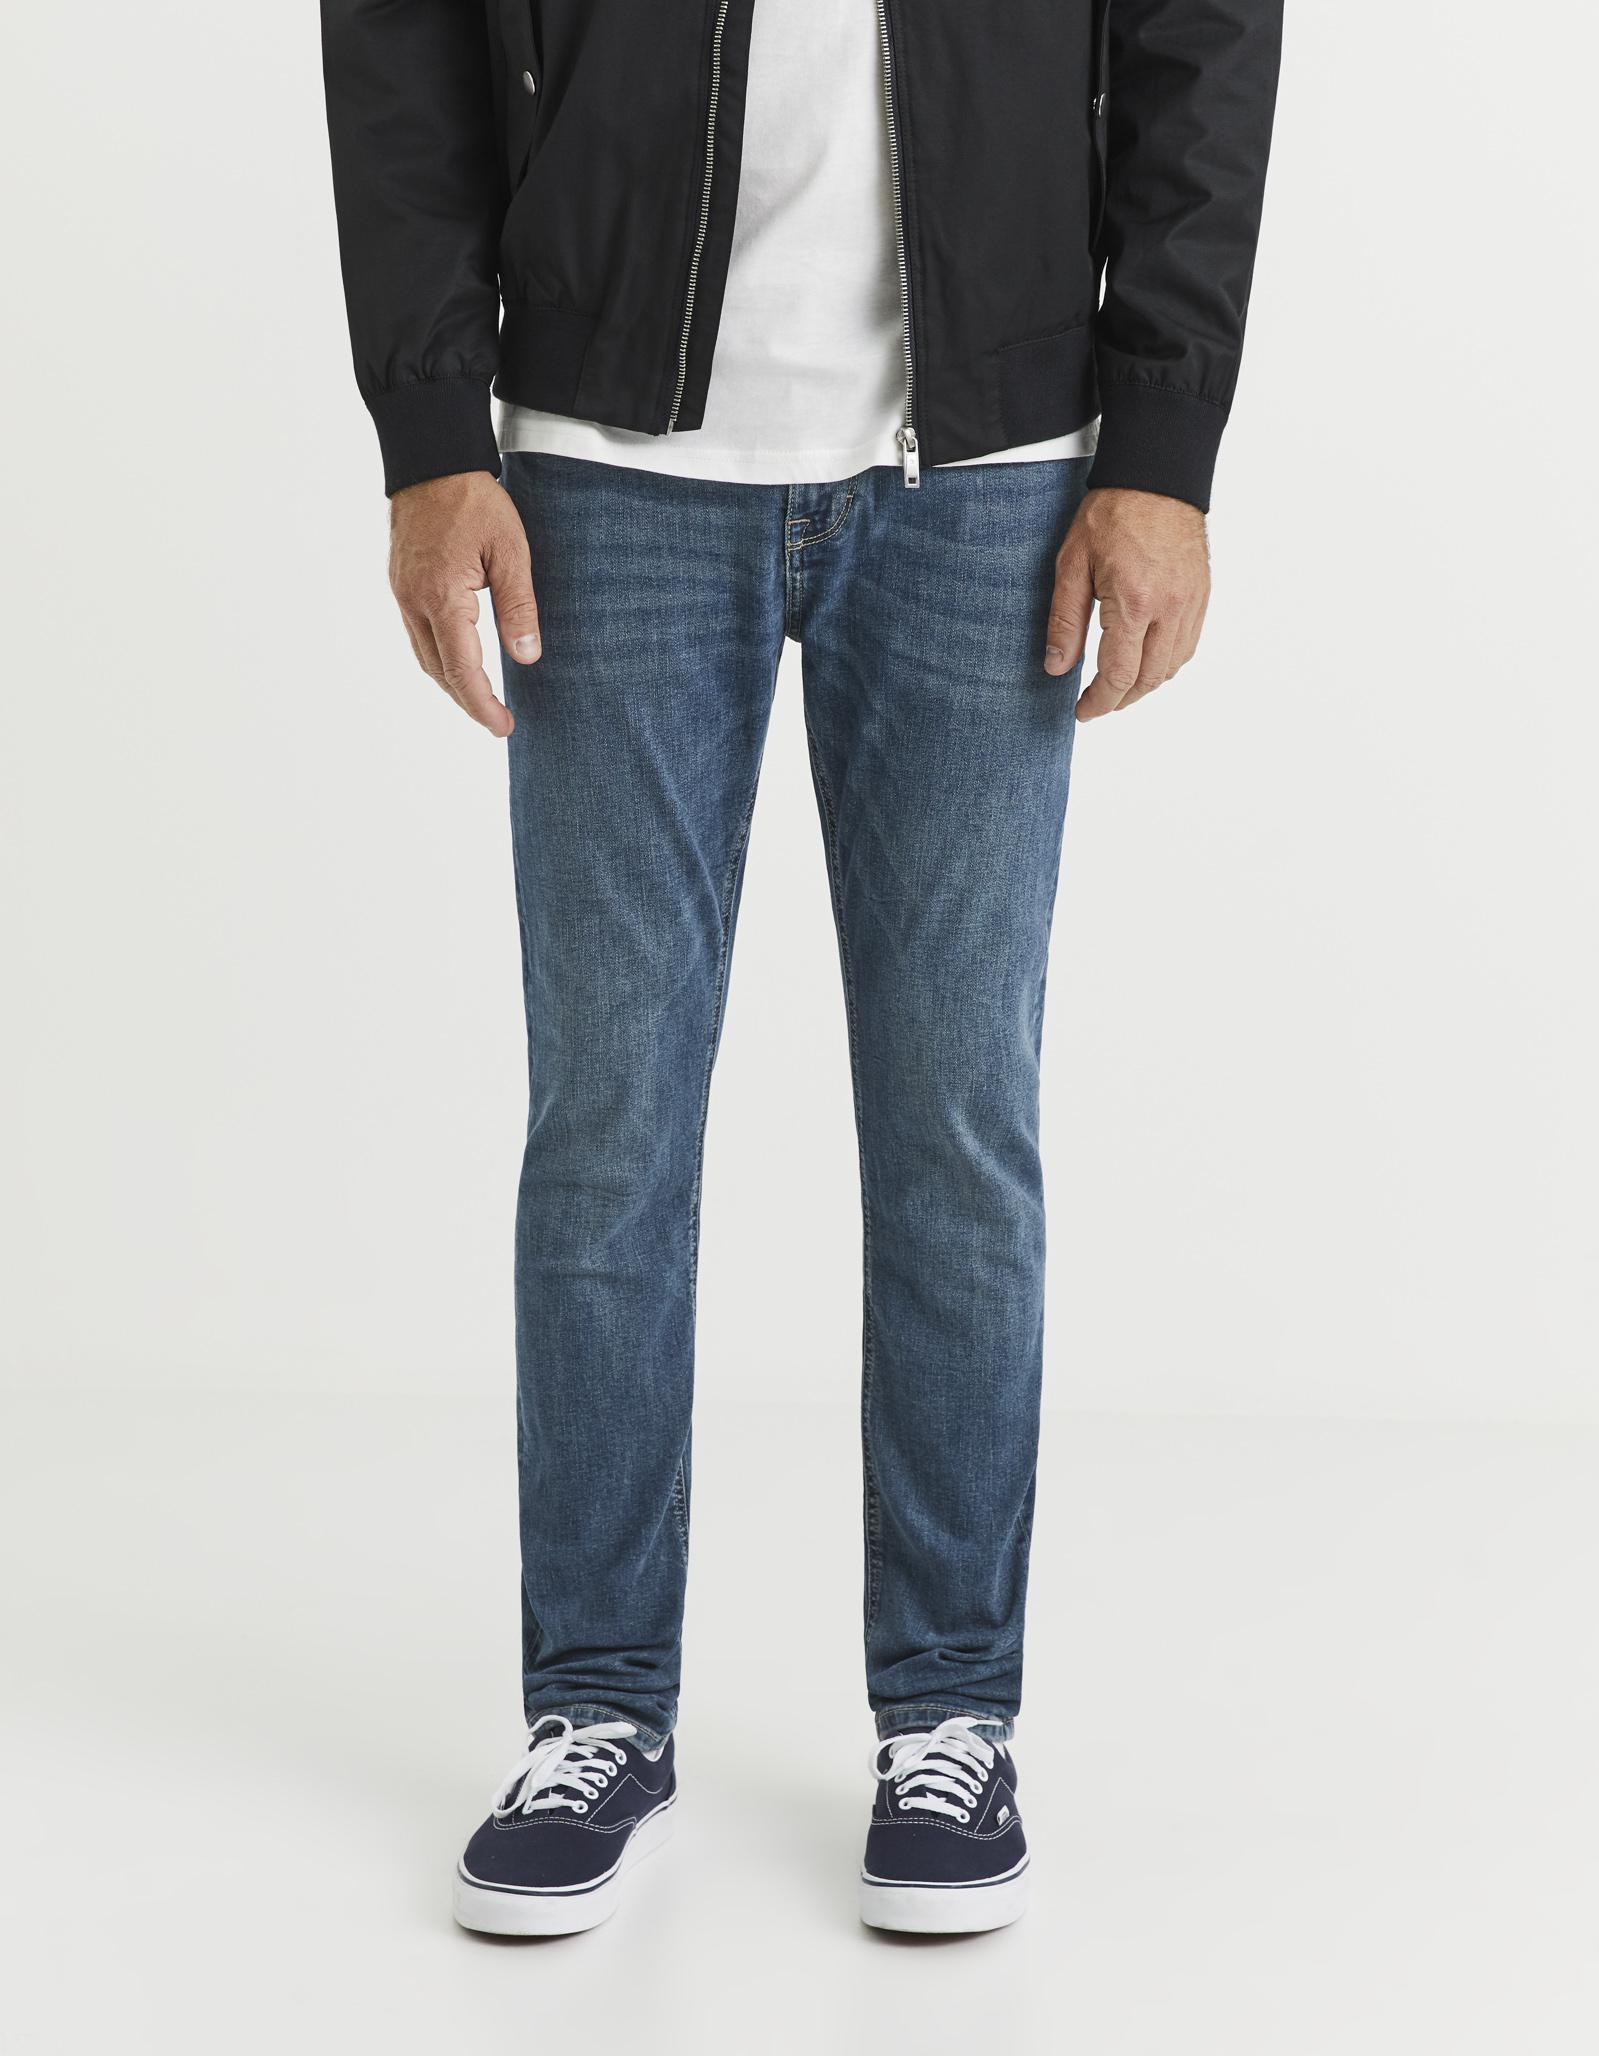 ג'ינס גזרת סלים